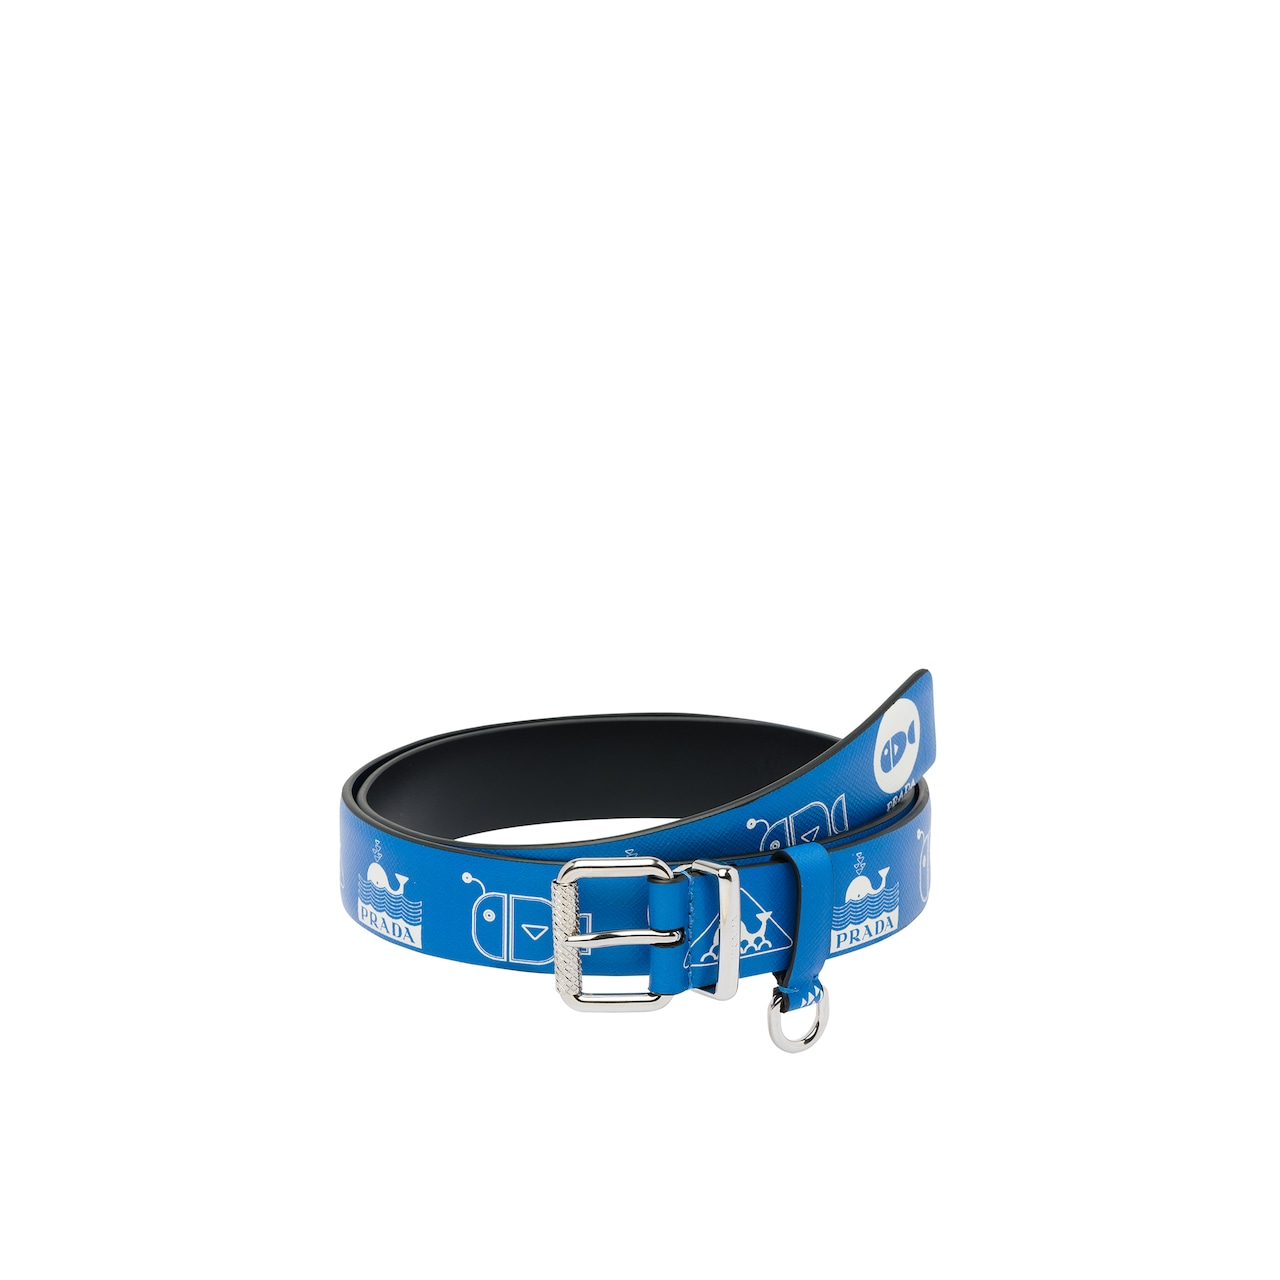 Printed Saffiano leather belt